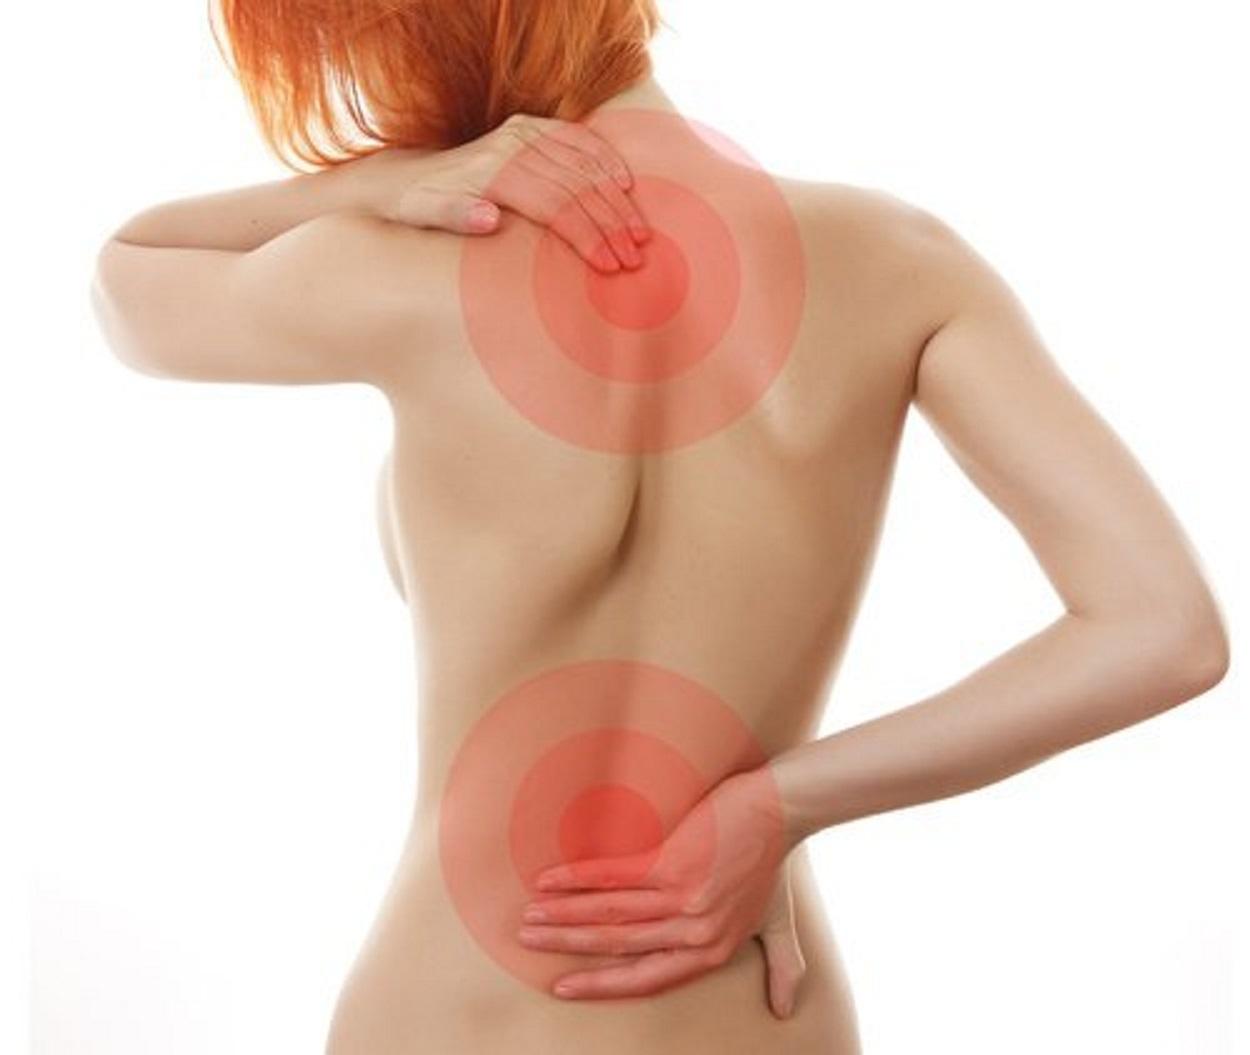 remedios-naturales-para-el-dolor-de-espalda-1